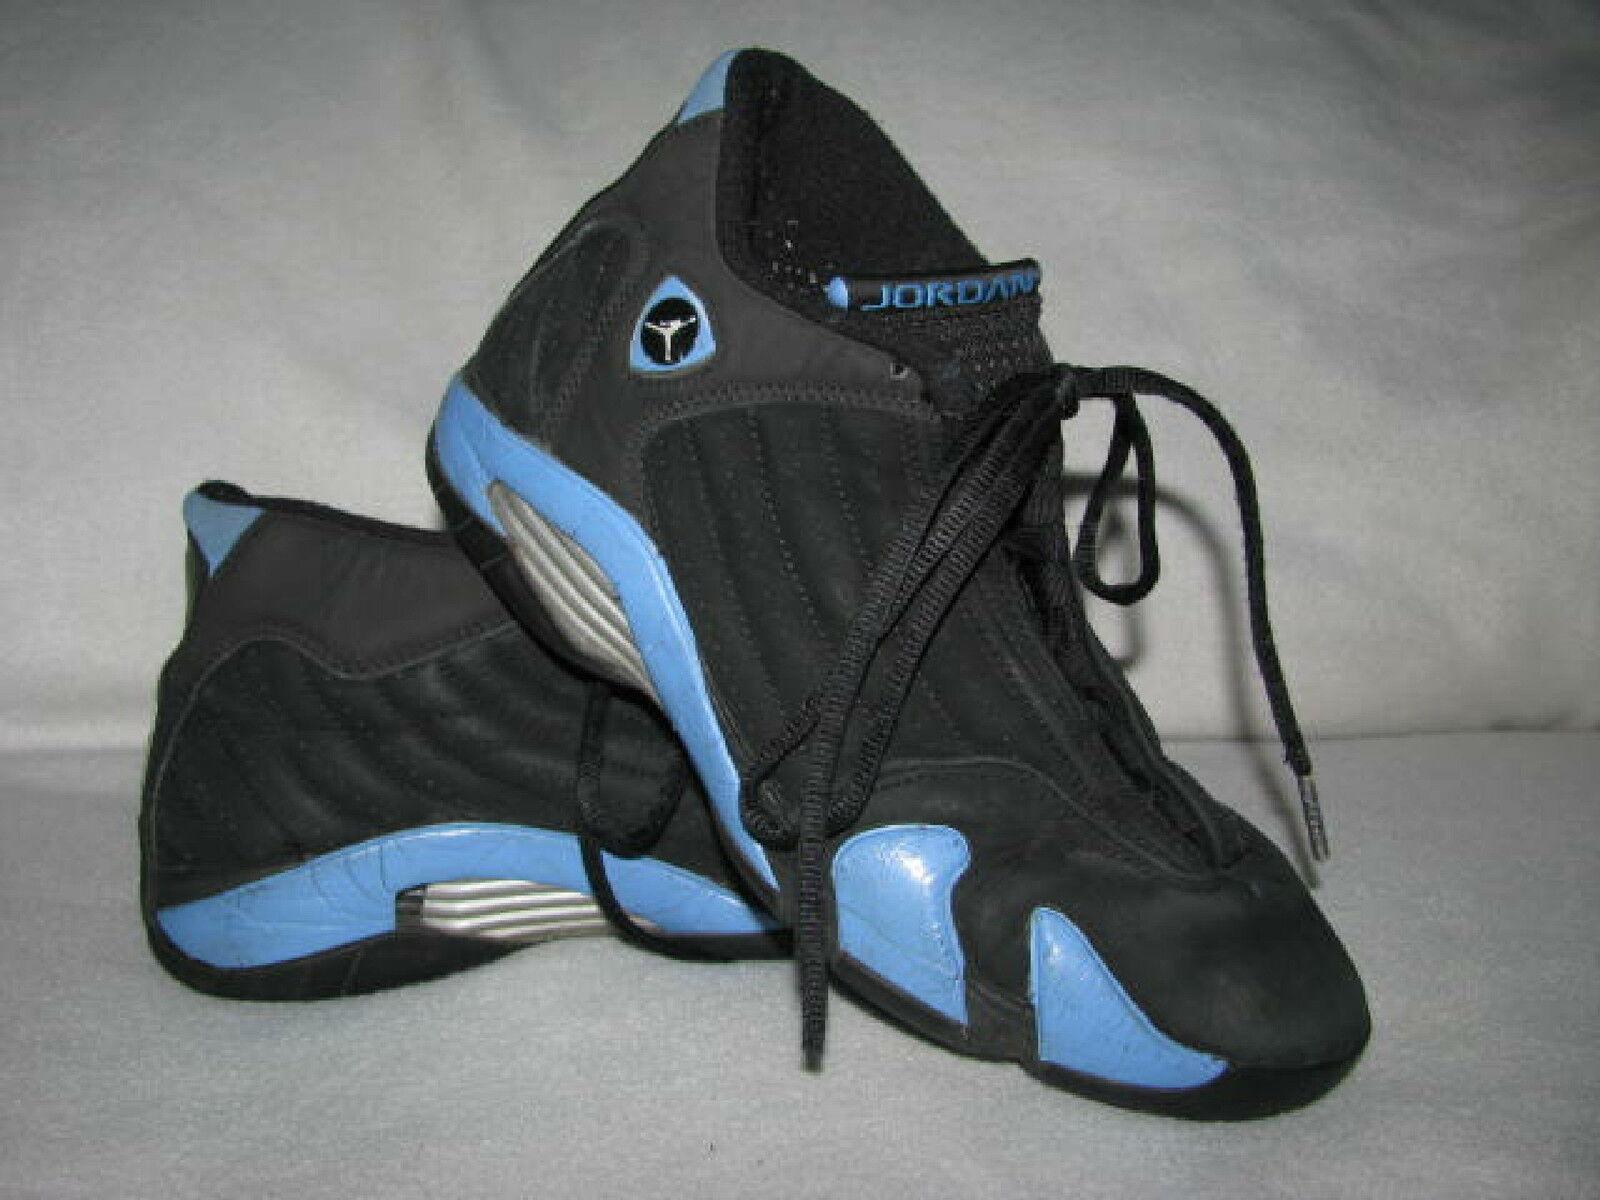 Cheap and beautiful fashion NIKE AirJORDAN 14 XIV Retro Sneakers Sz 7.5 Black University Blue 311832-041